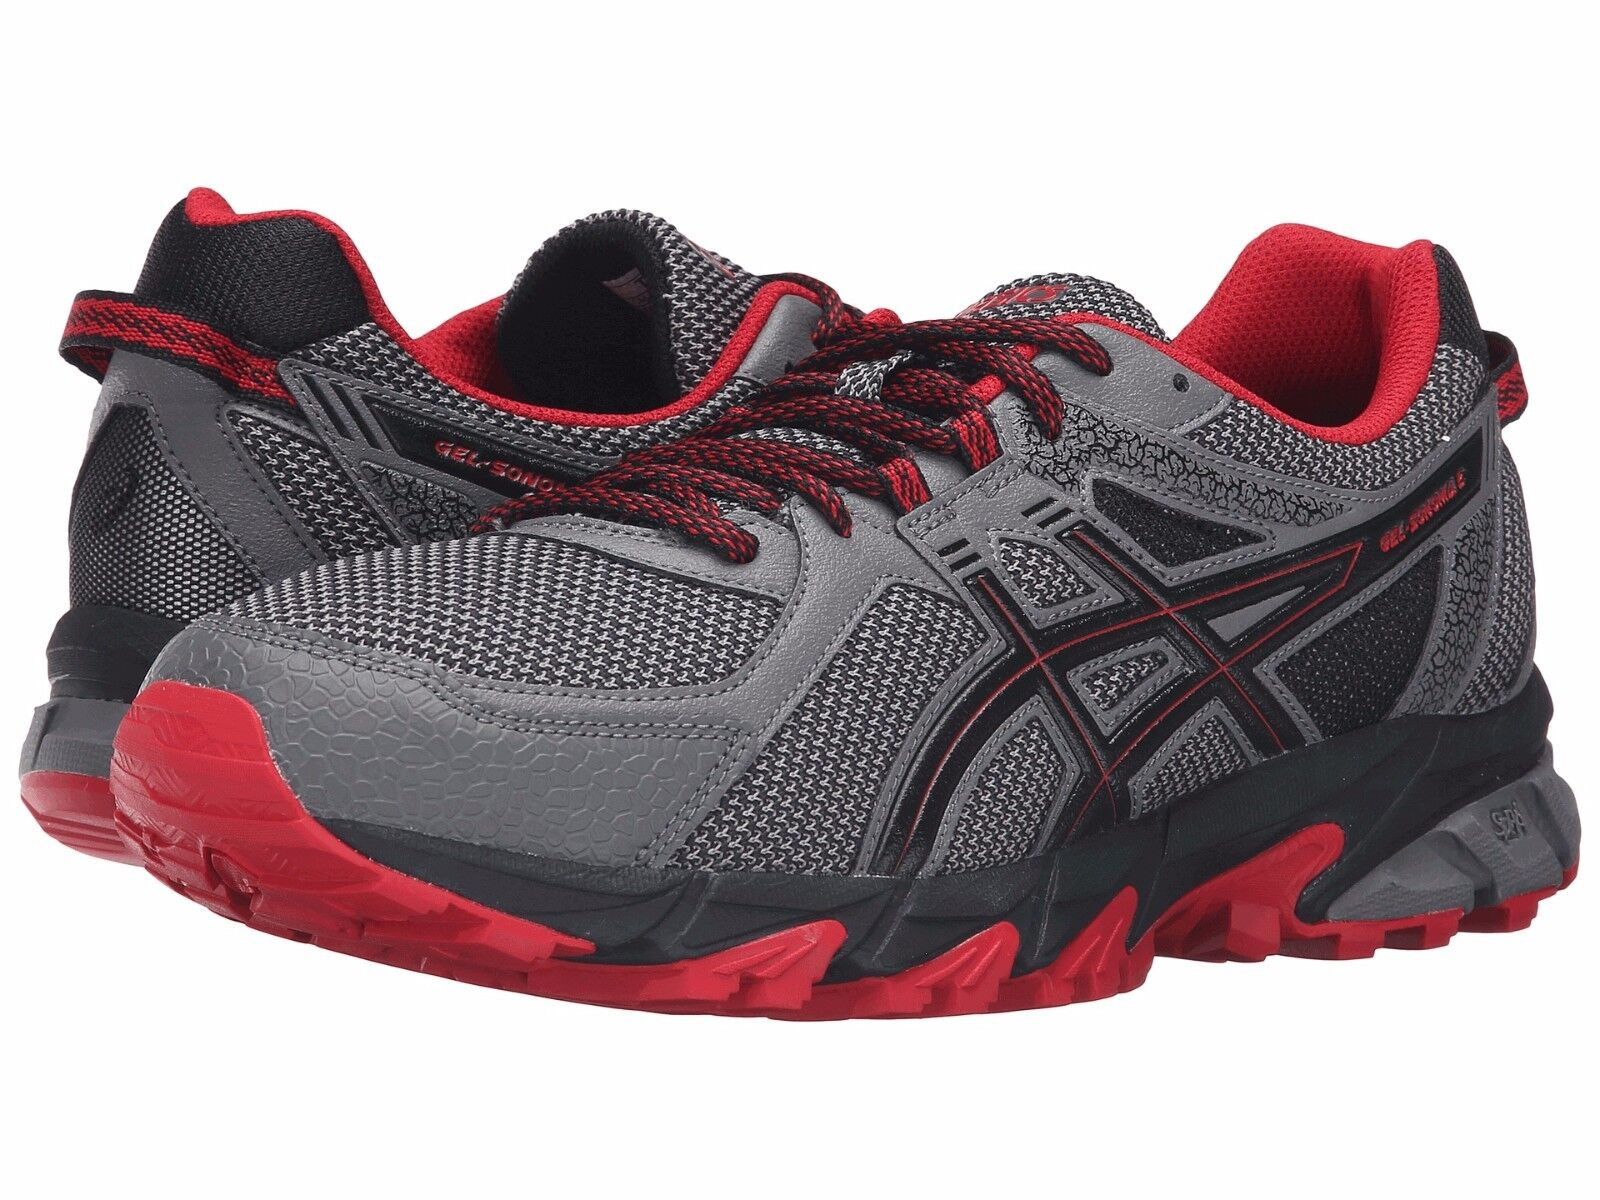 NIB Men's Asics Gel Sonoma 2 Trail shoes Venture Carbon Red 412 610 Choose Size